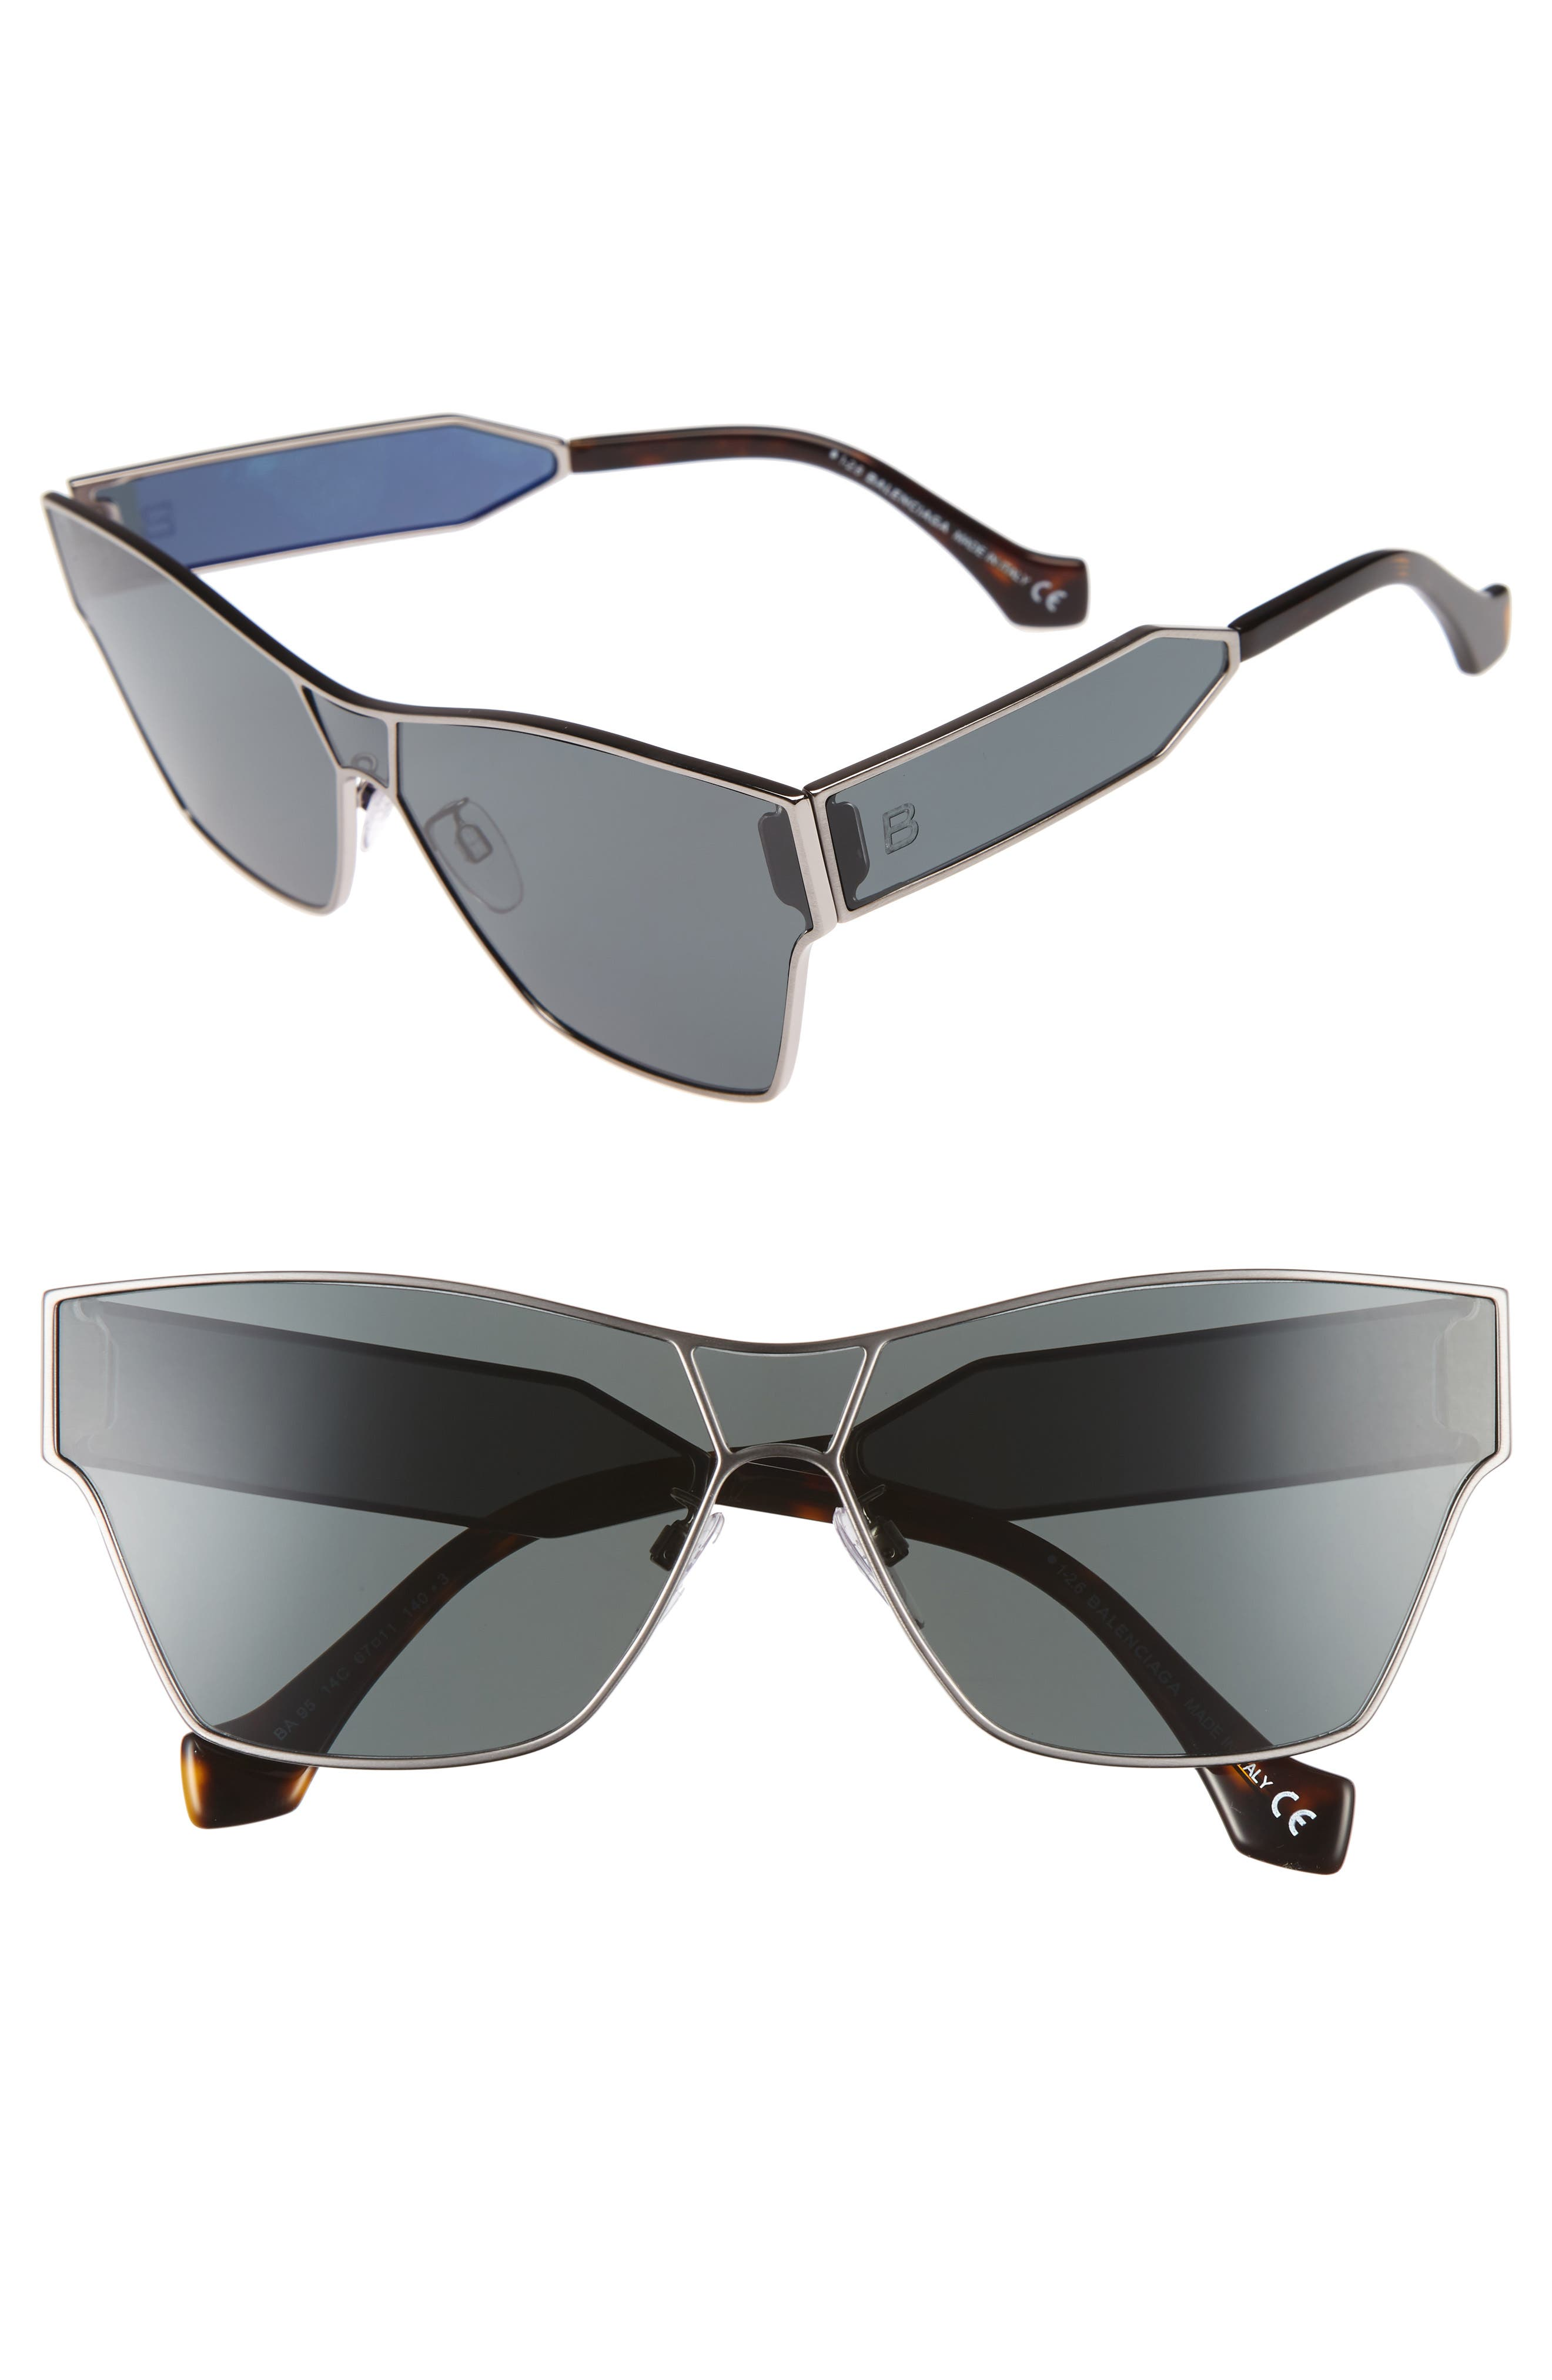 67mm Sunglasses,                         Main,                         color, Ruthenium Front/ Dark Havana